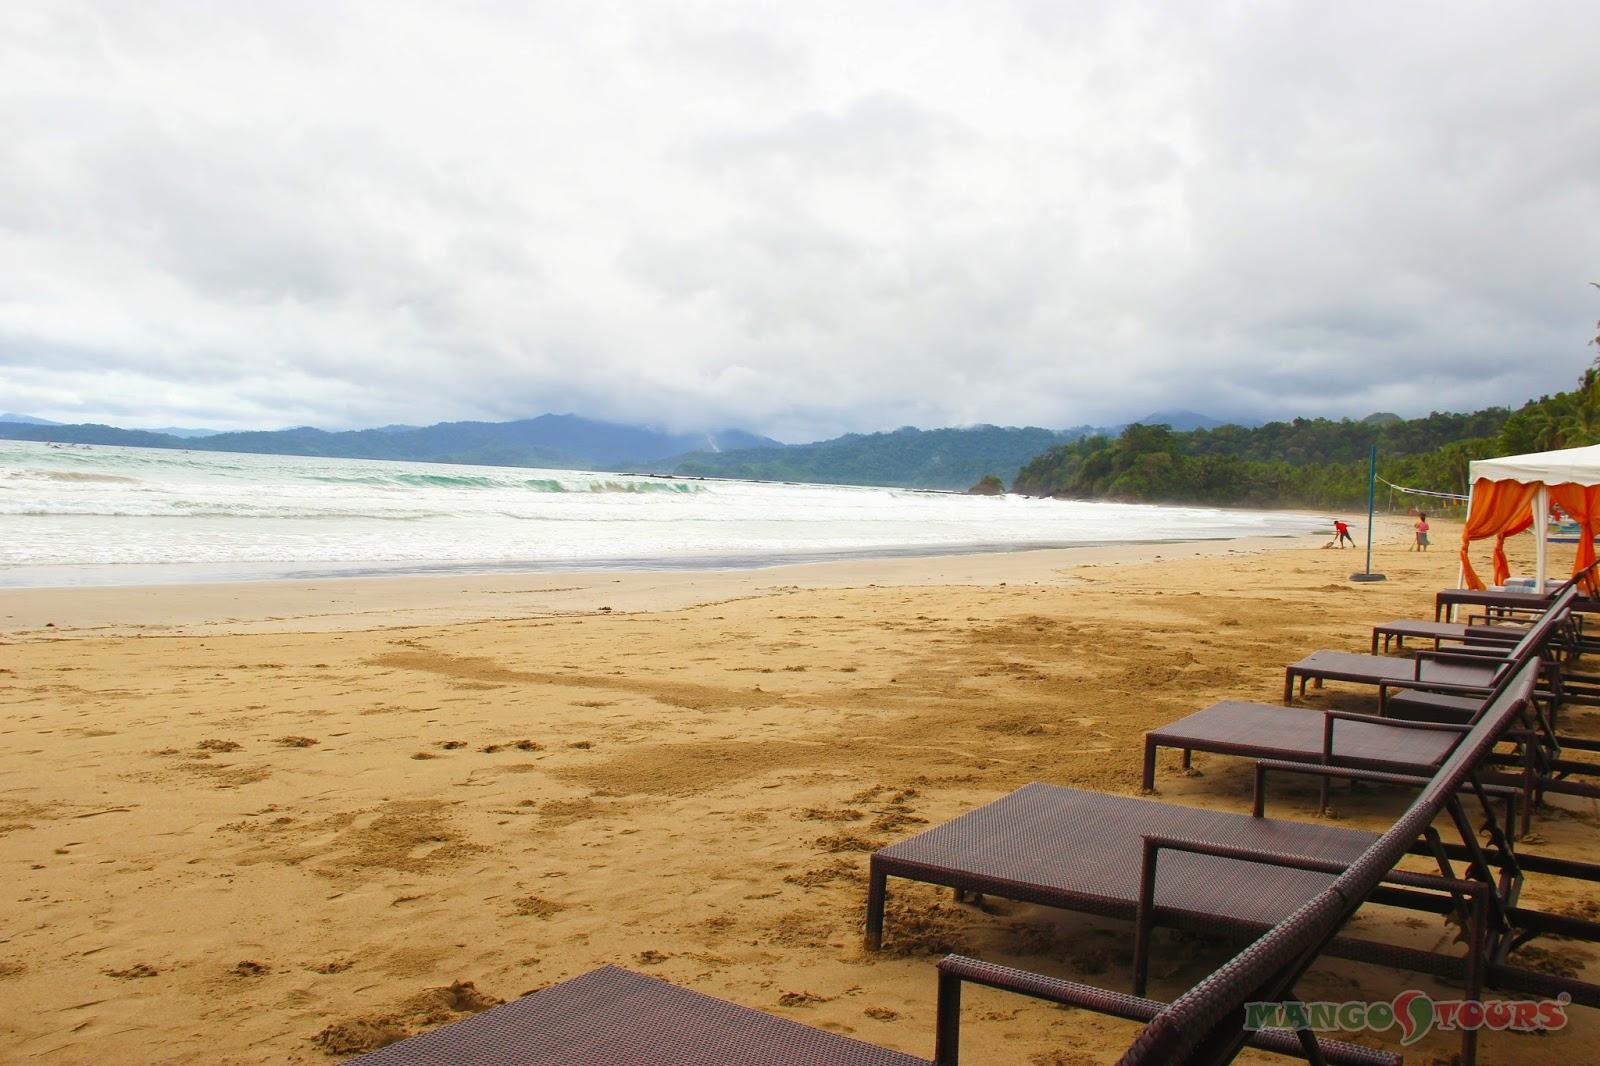 Mango Tours Philippines Sheridan Beach Resort & Spa Sabang Beach Puerto Princesa Palawan